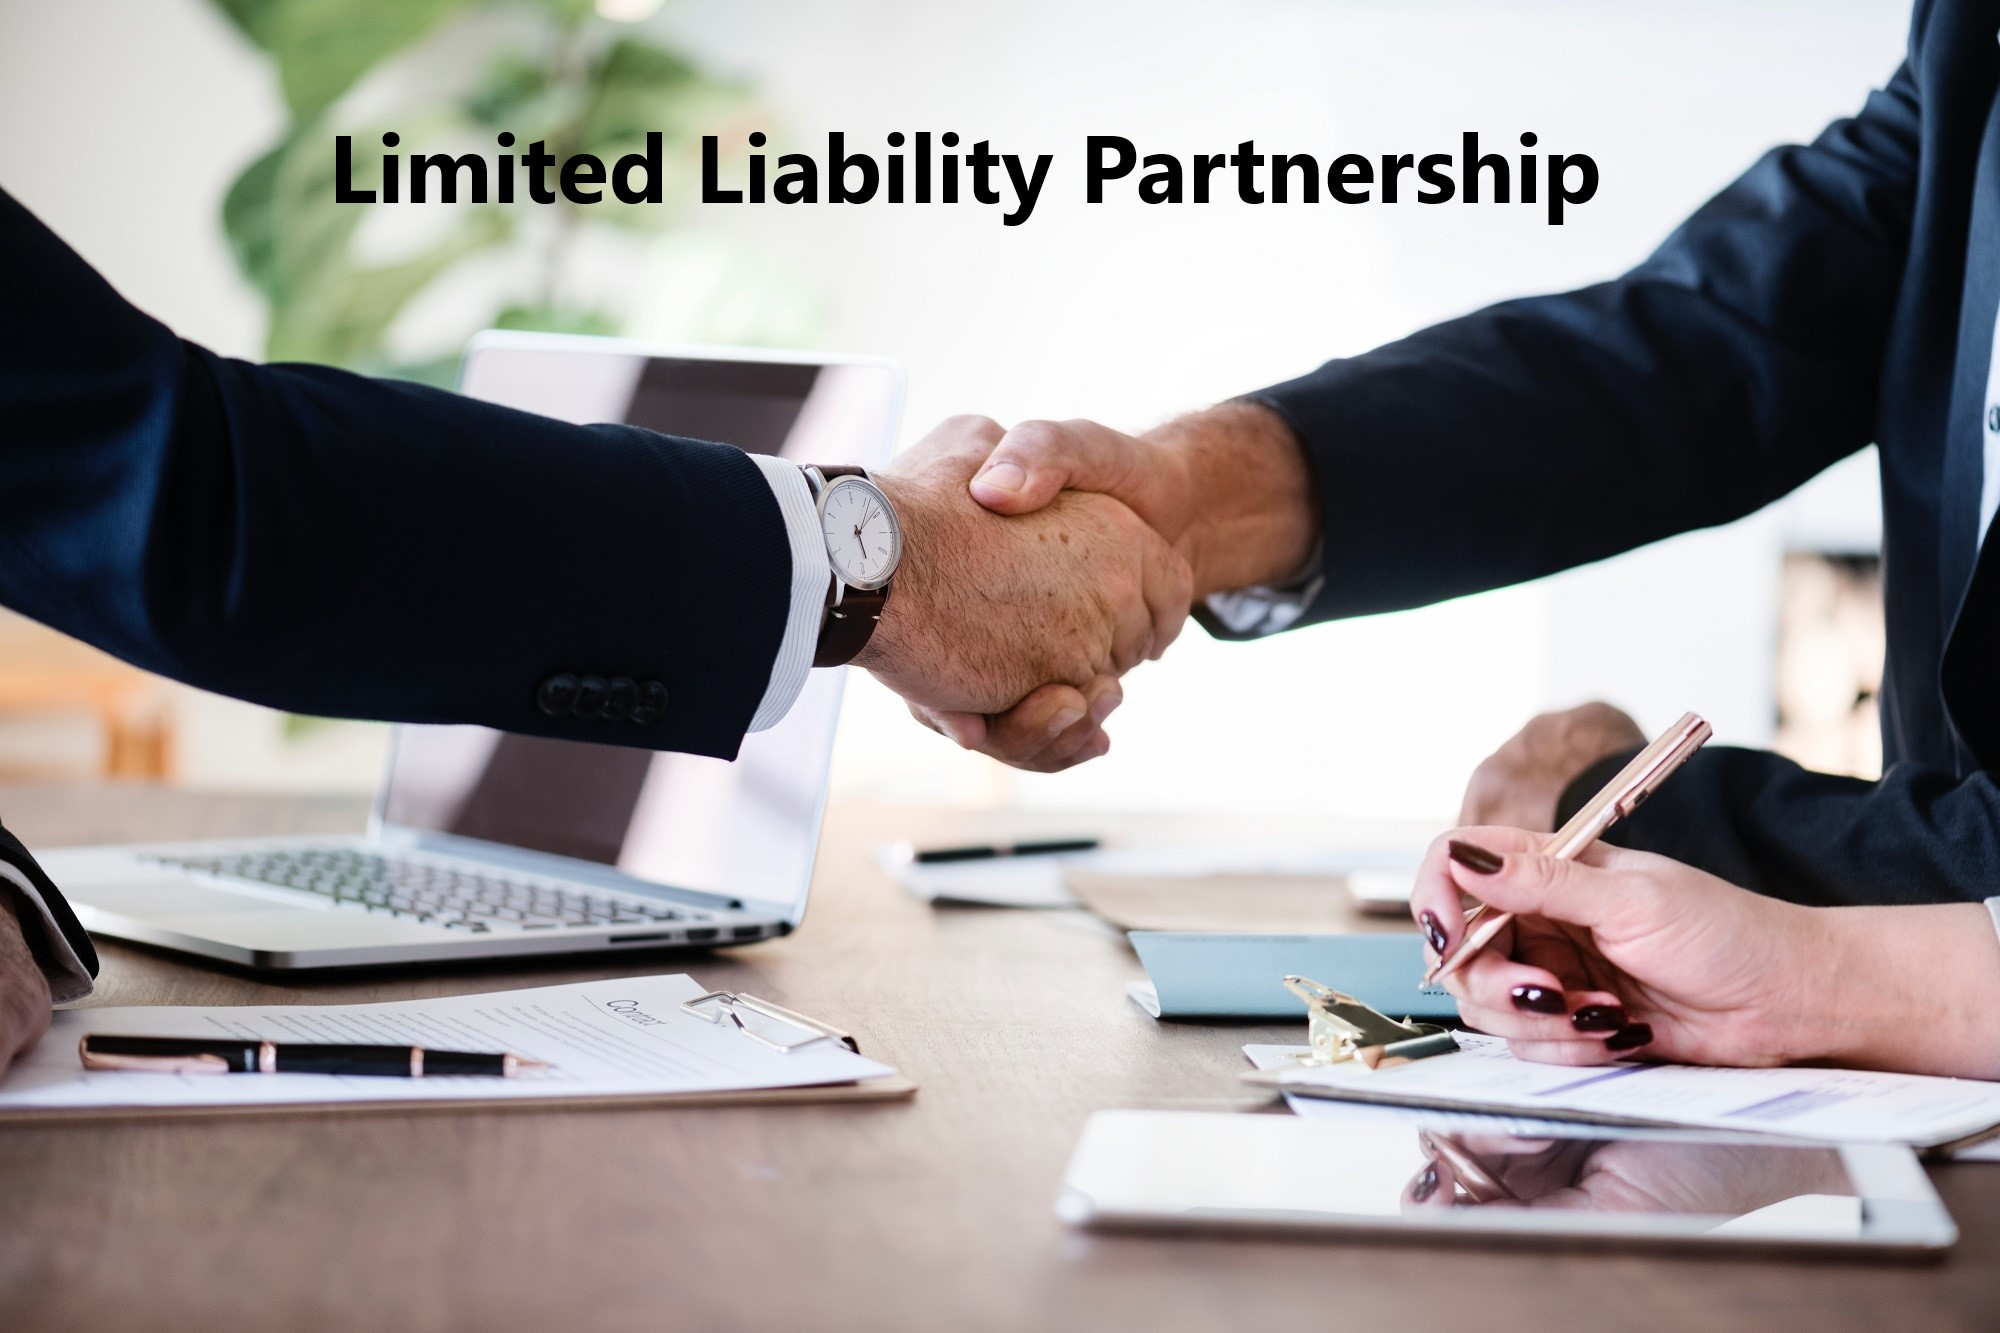 Limited Liability Partnership Registration, LLP